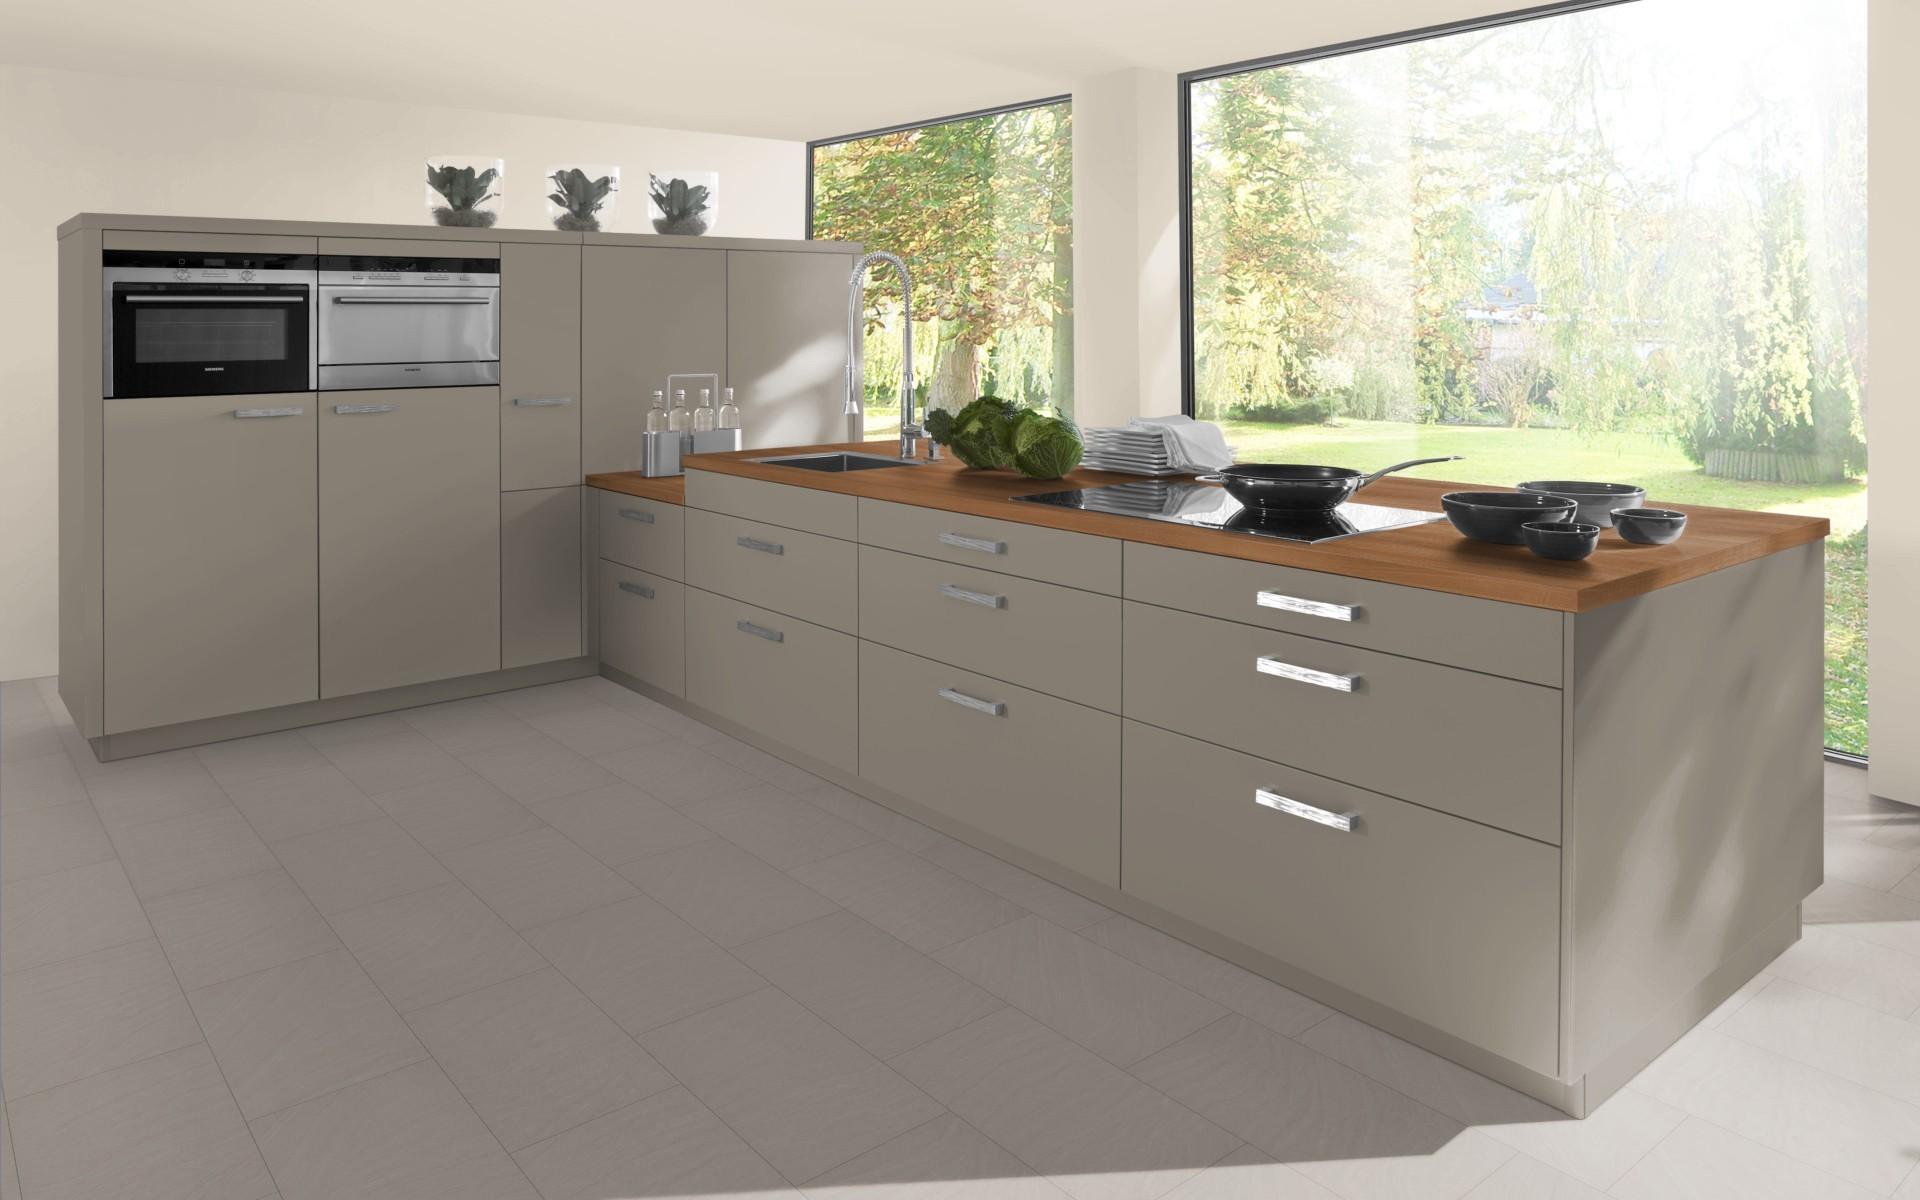 Contemporary Kitchen Door in Stone Grey